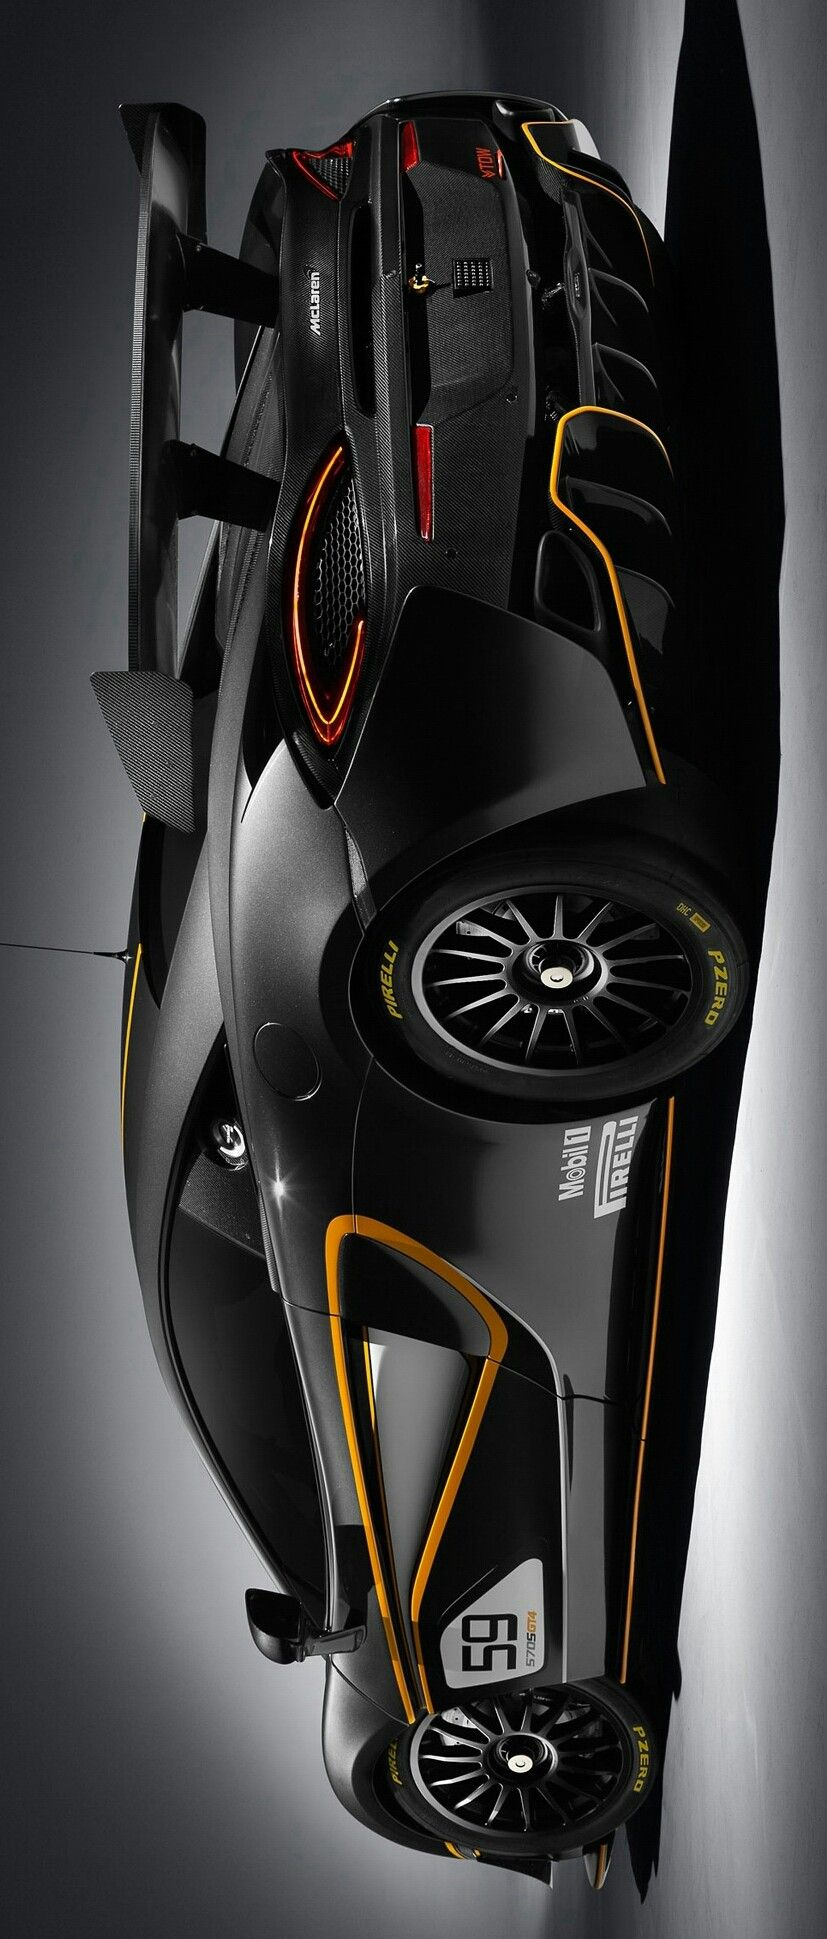 2016 Mclaren 570s Gt4 By Levon Super Cars Sport Cars Amazing Cars